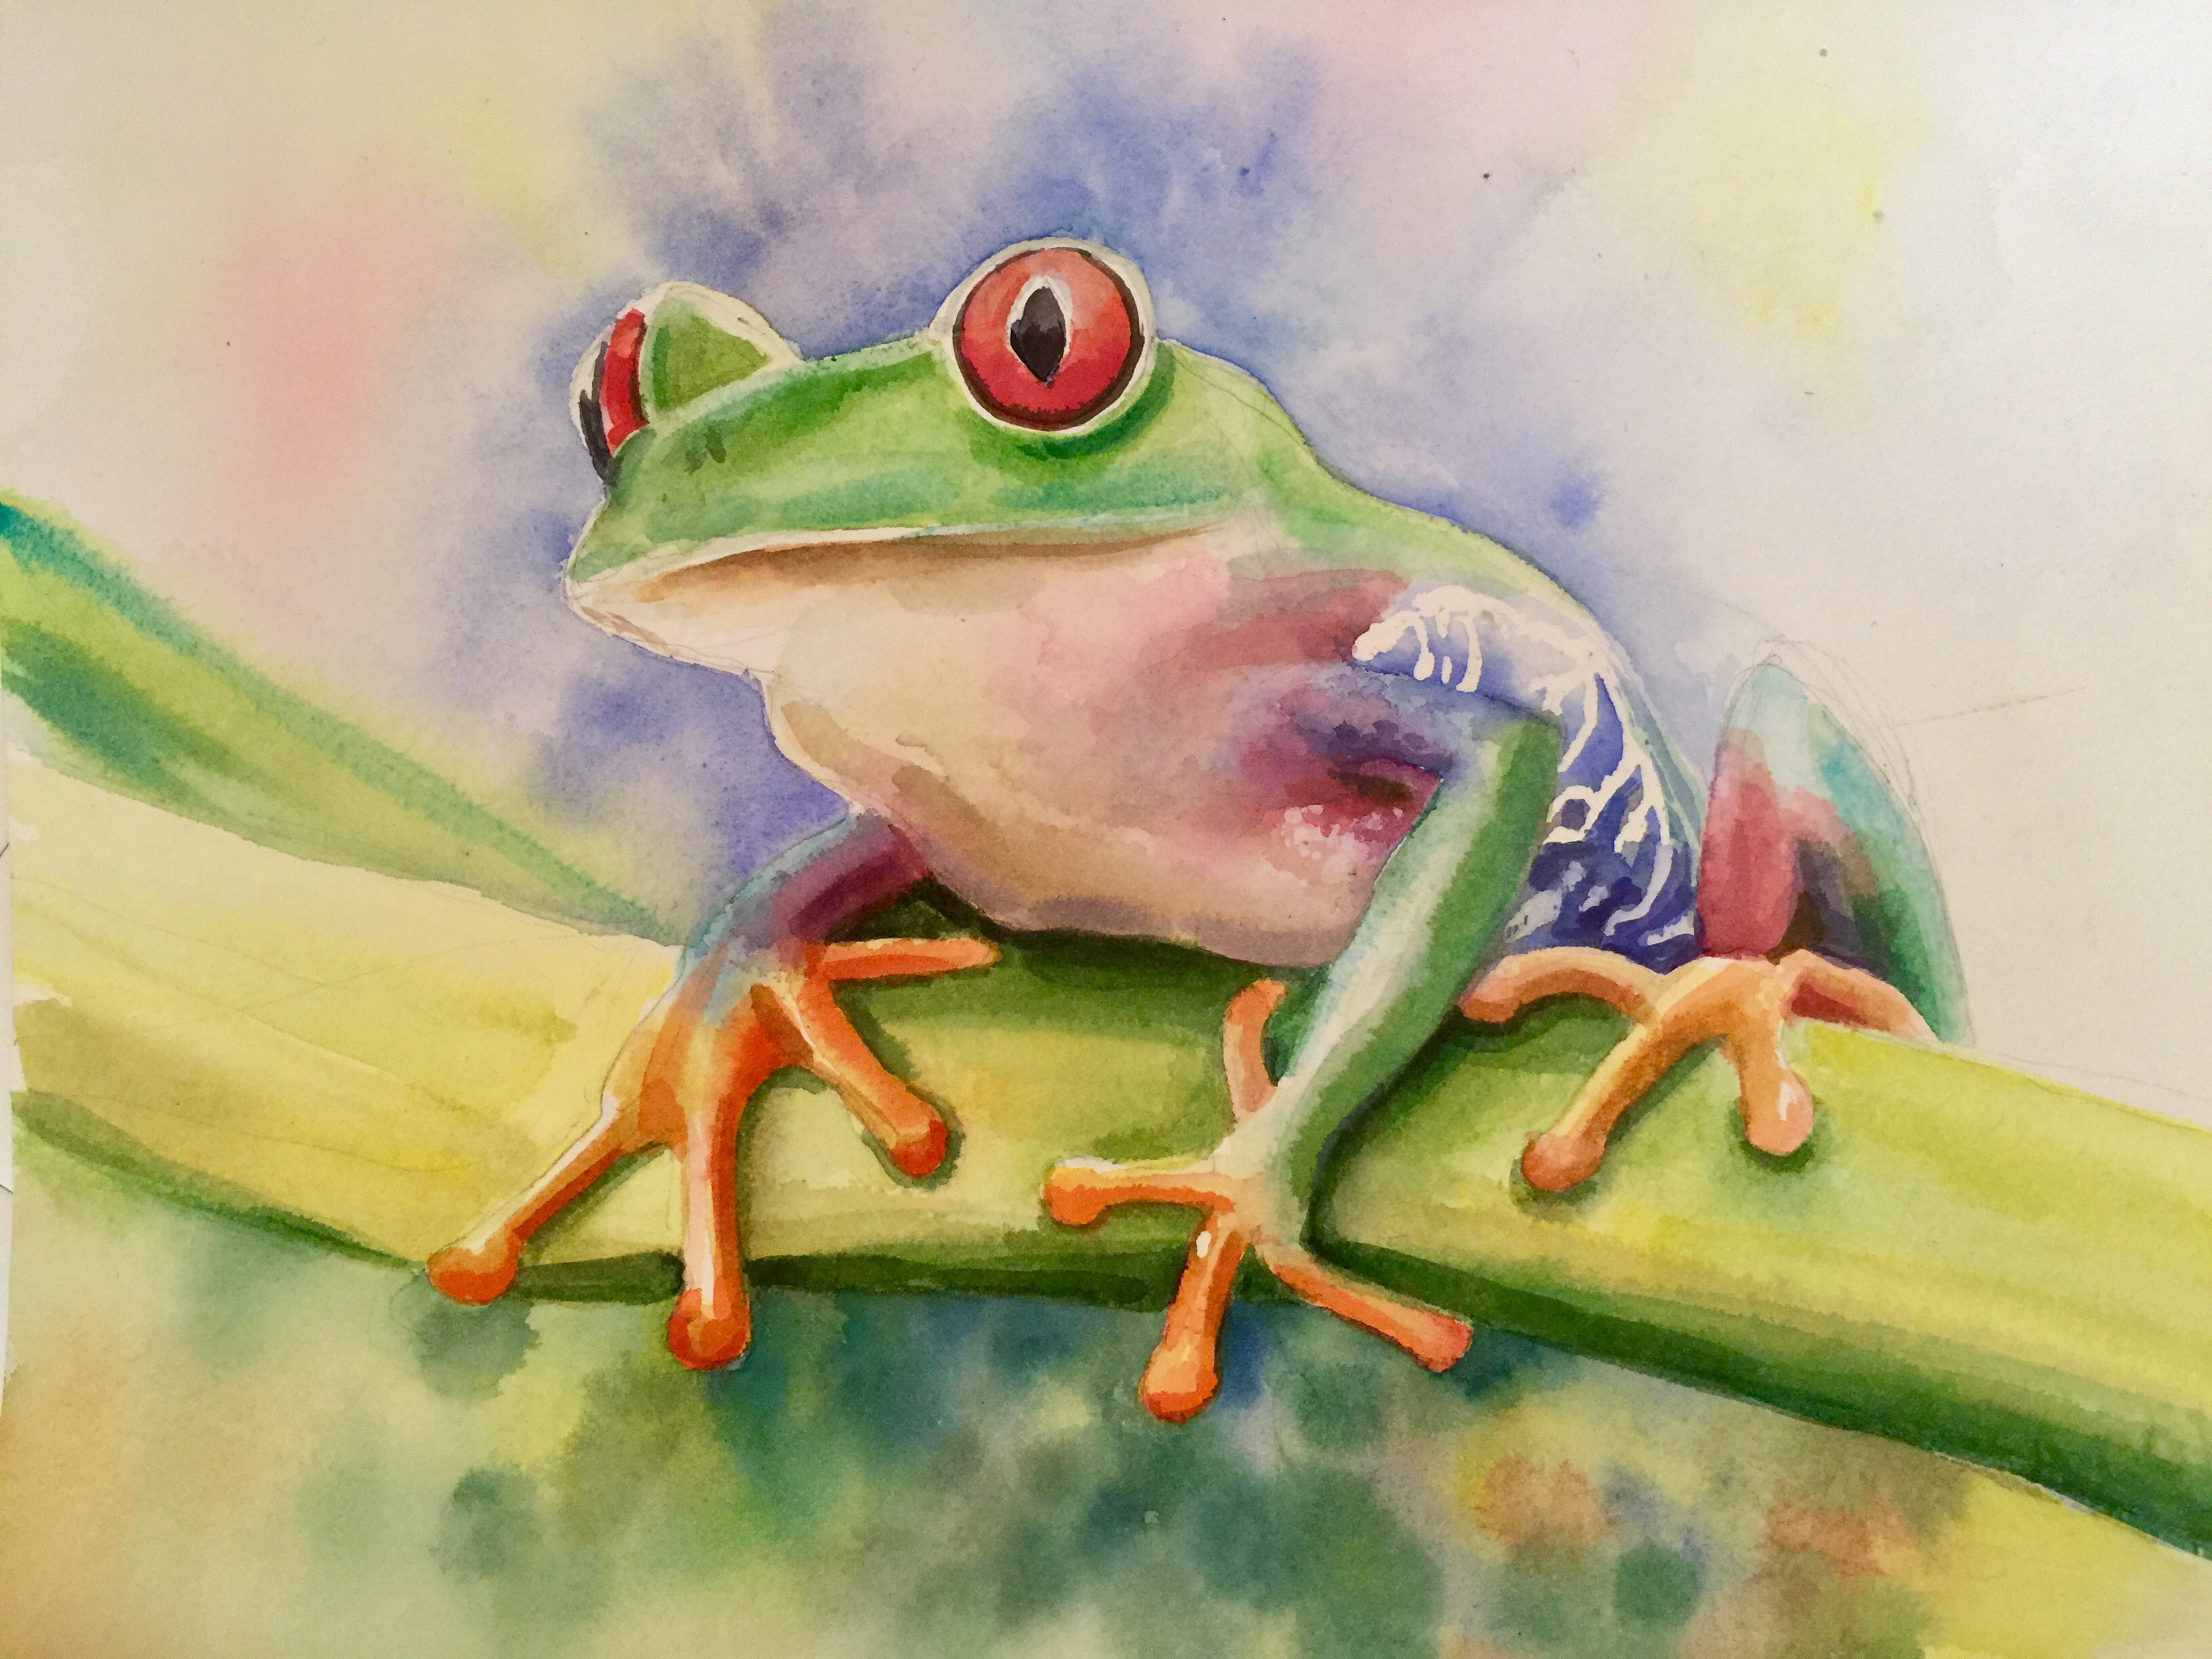 redeyefrog